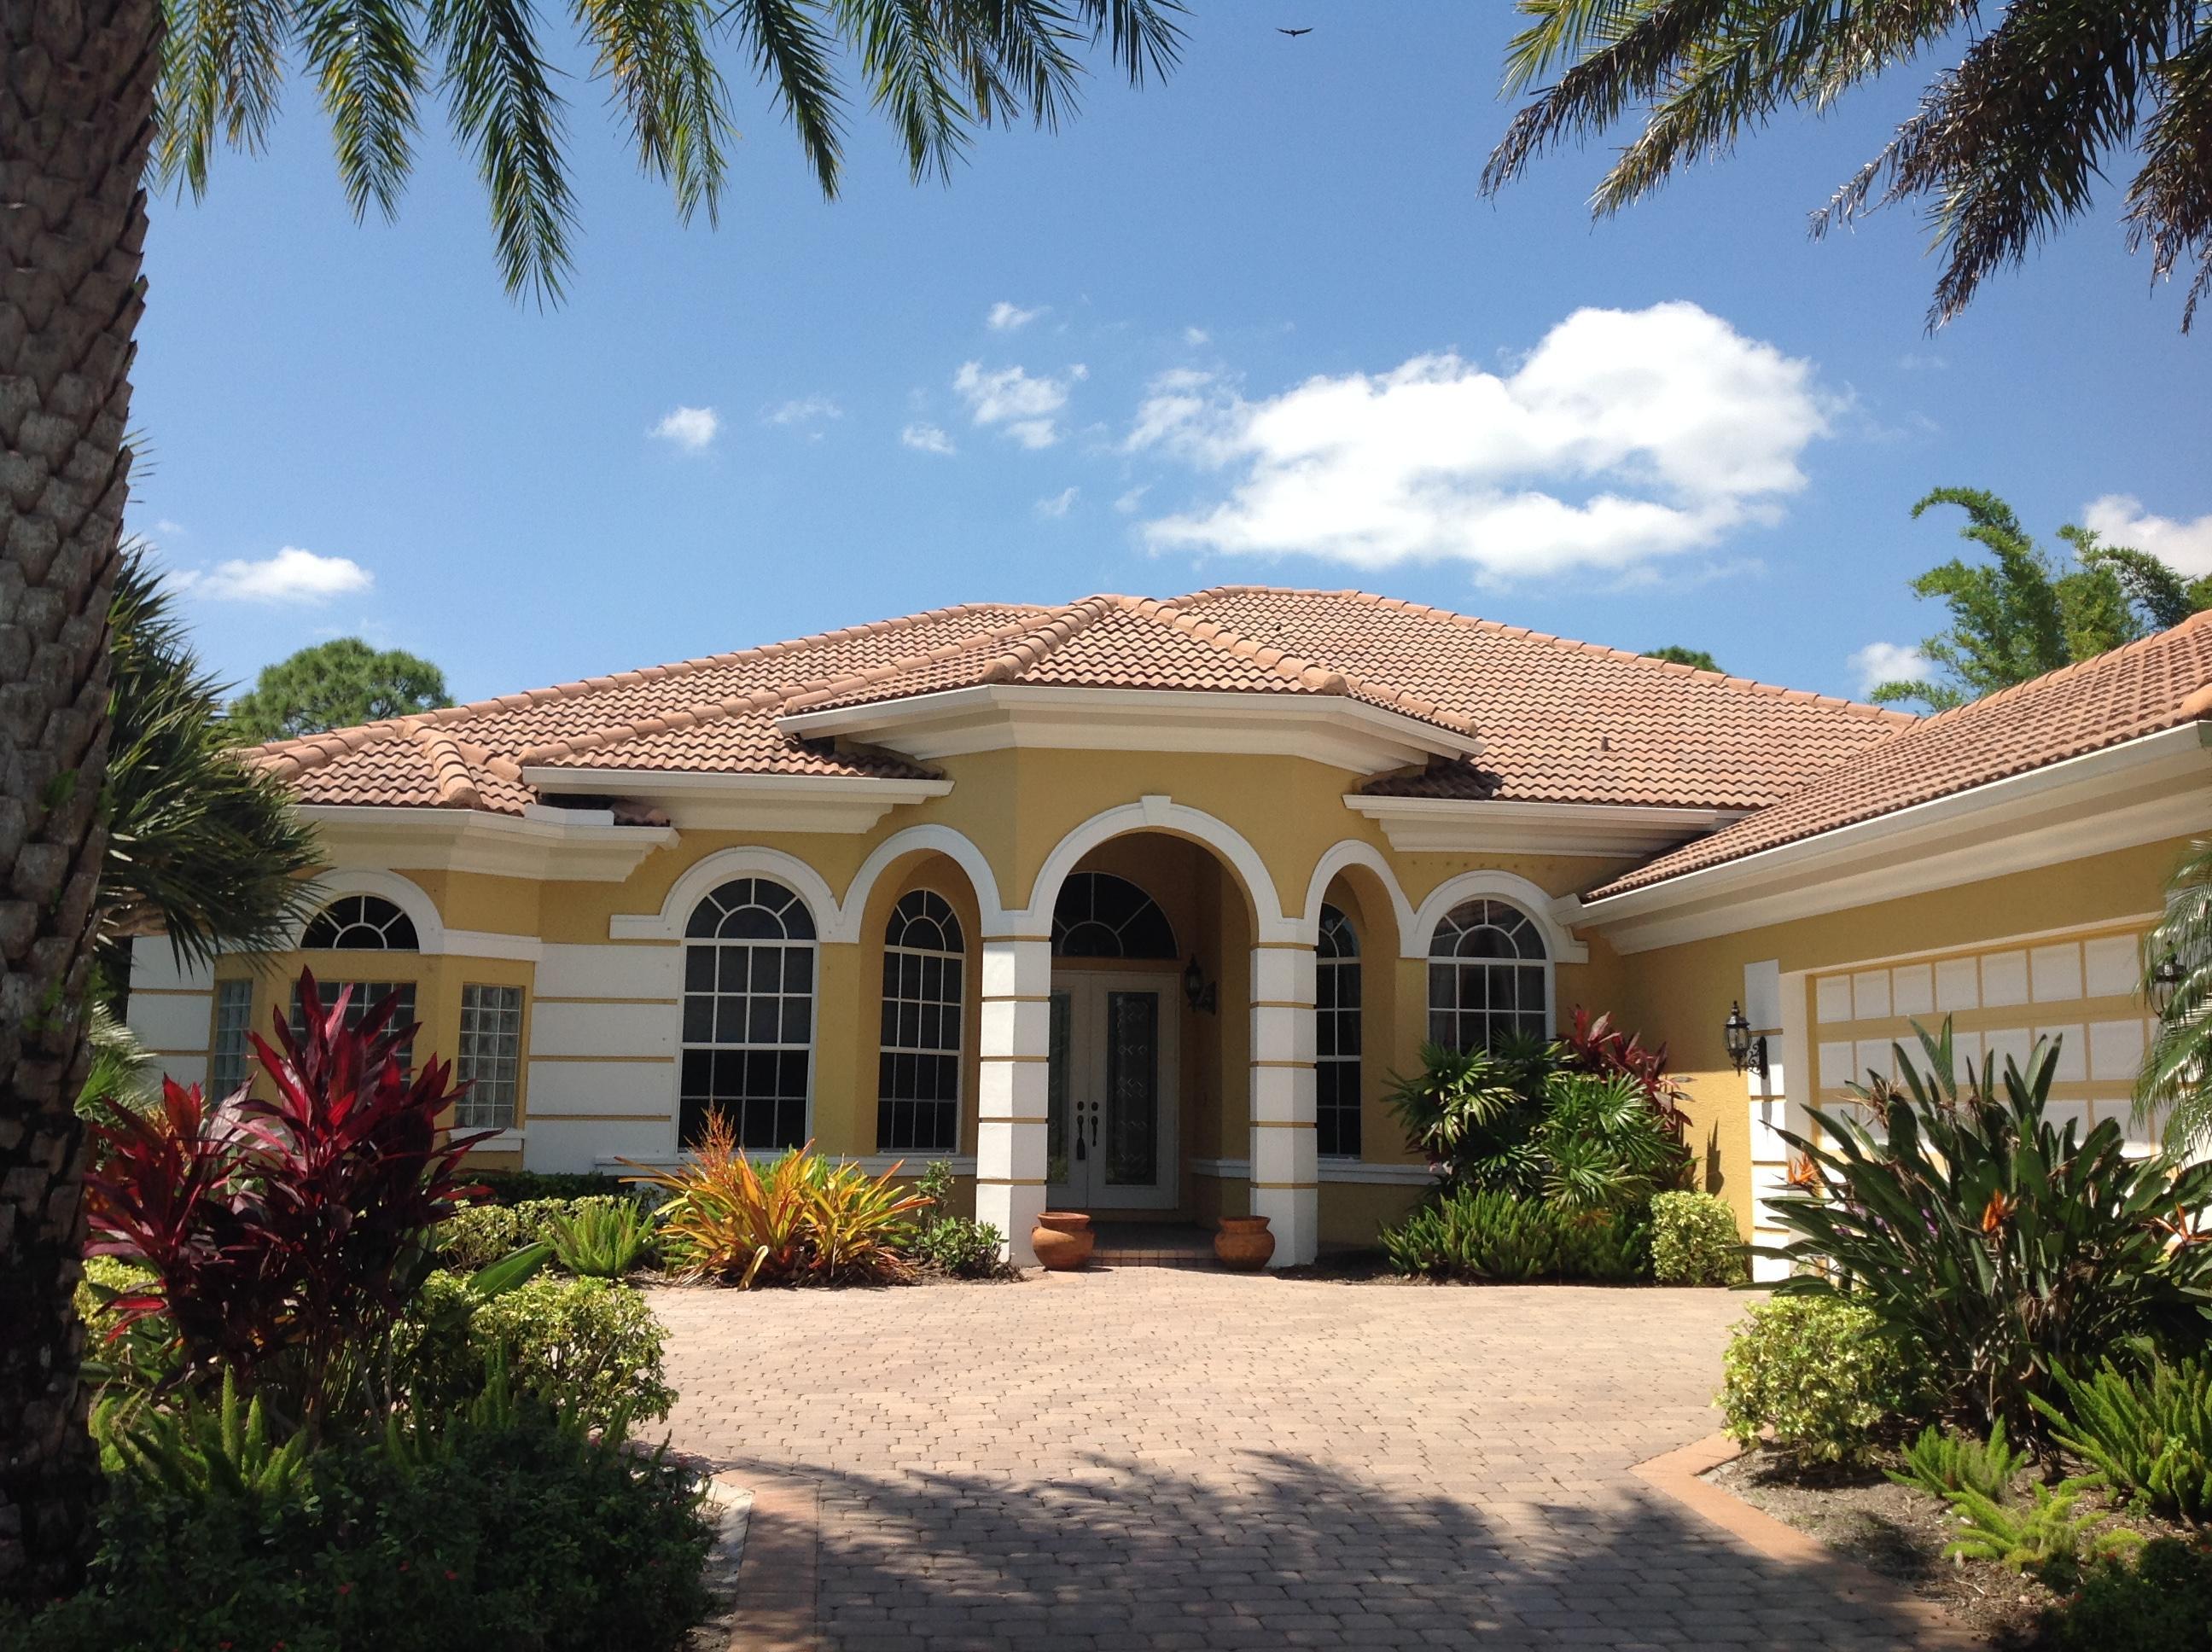 655 Squire Johns, Palm City, Florida 34990